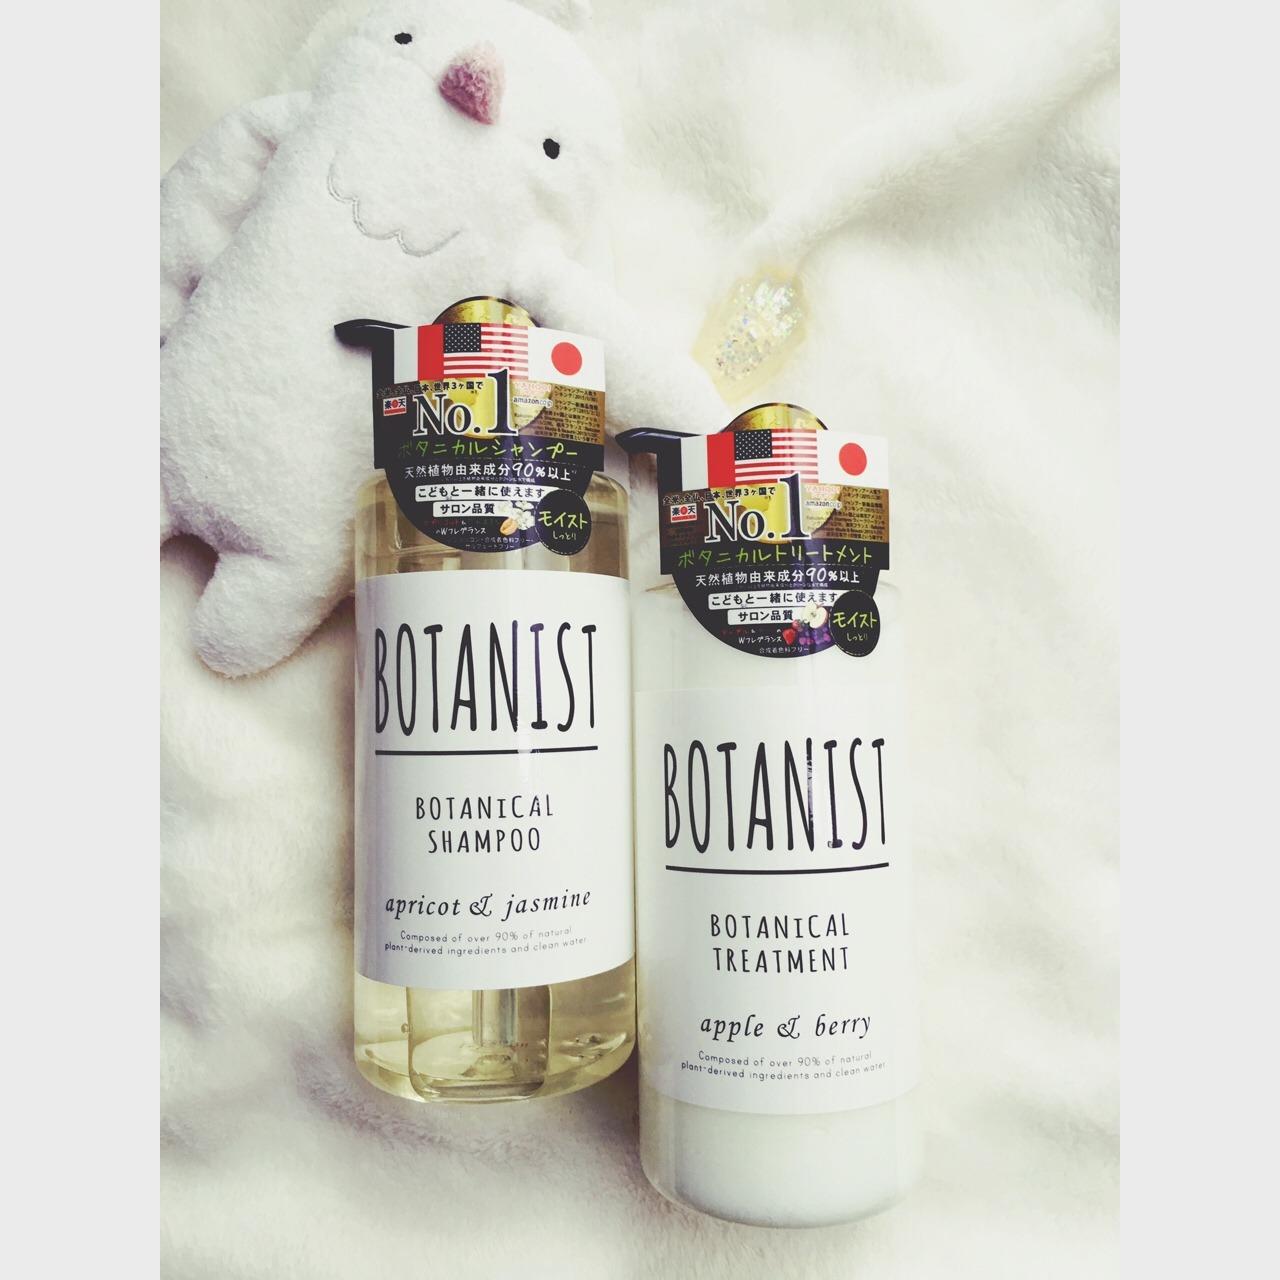 botanist的洗发水和护发素图片